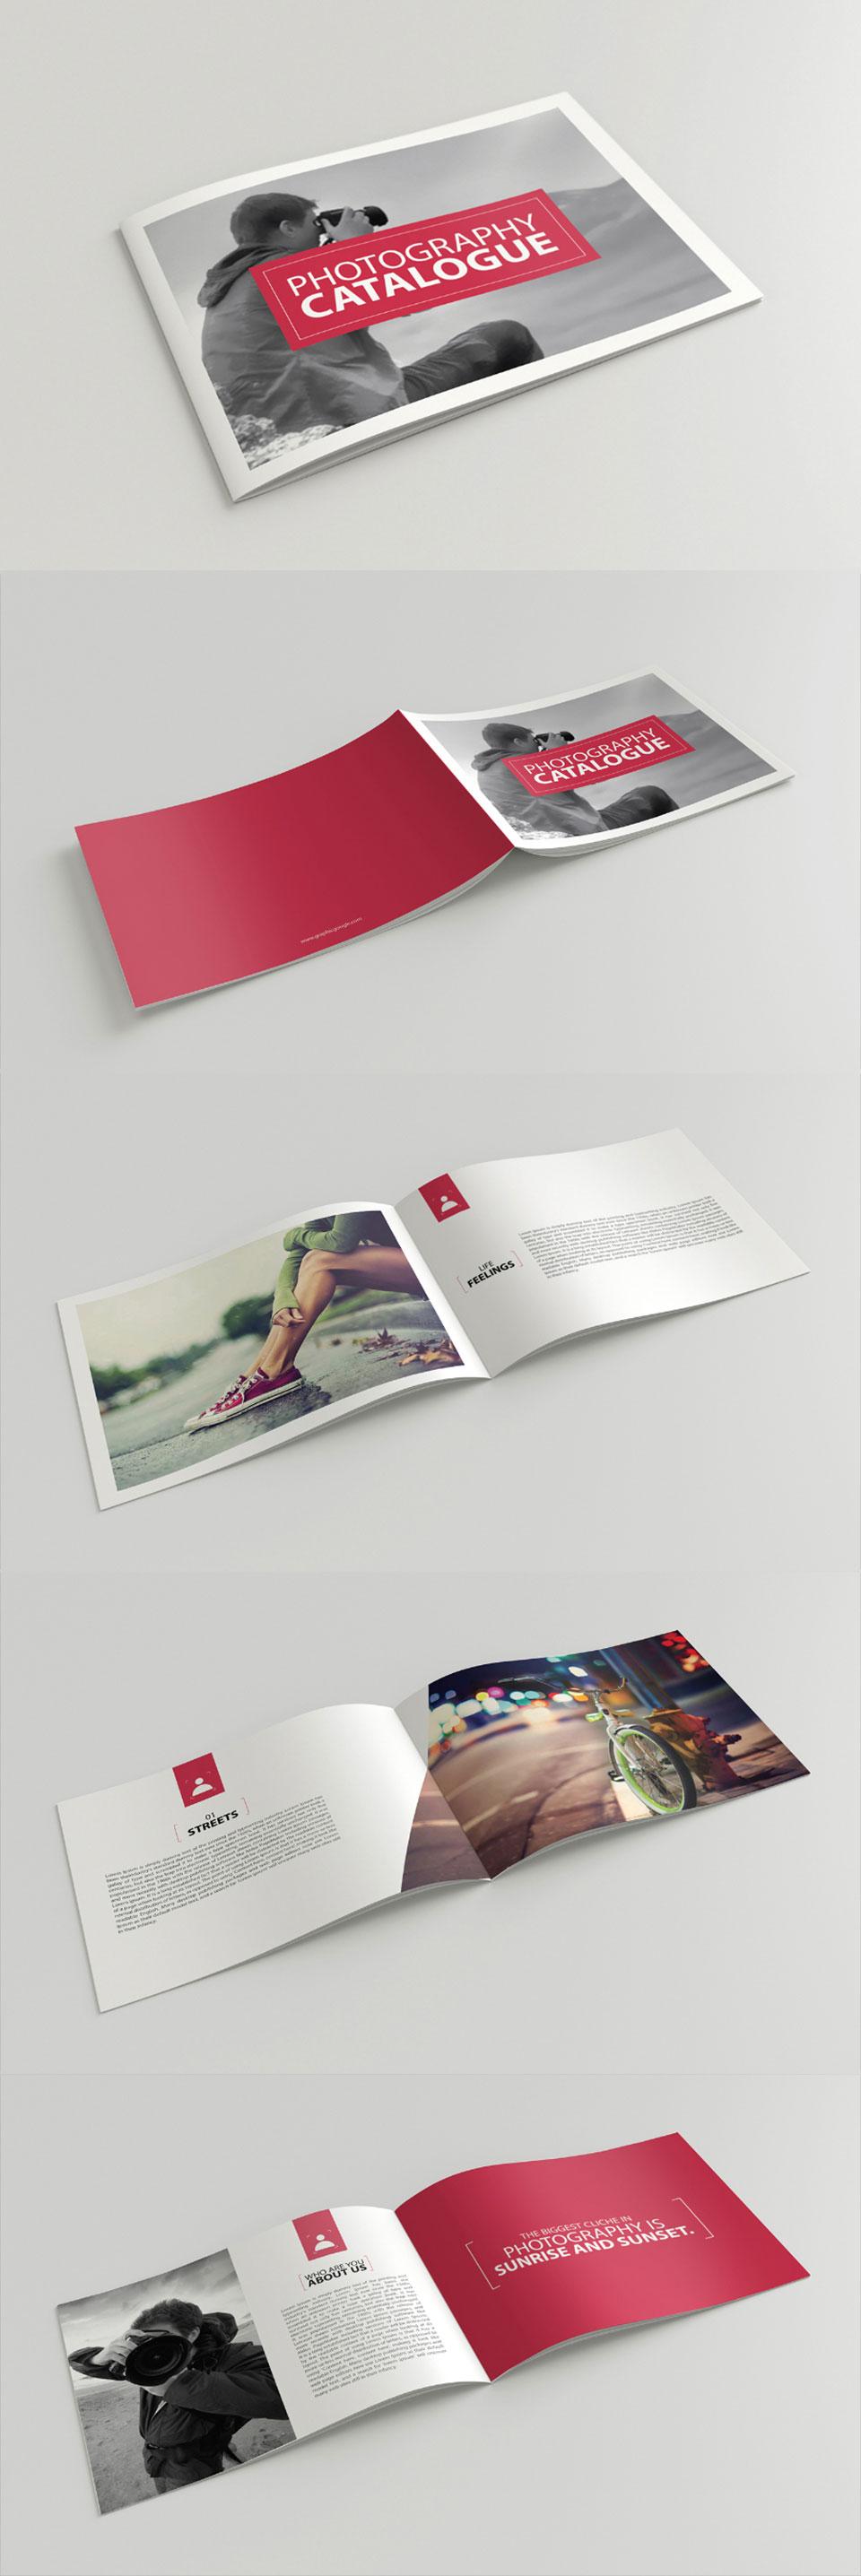 free:时尚的宽版画册排版设计模版下载[ai格式]设计素材模板